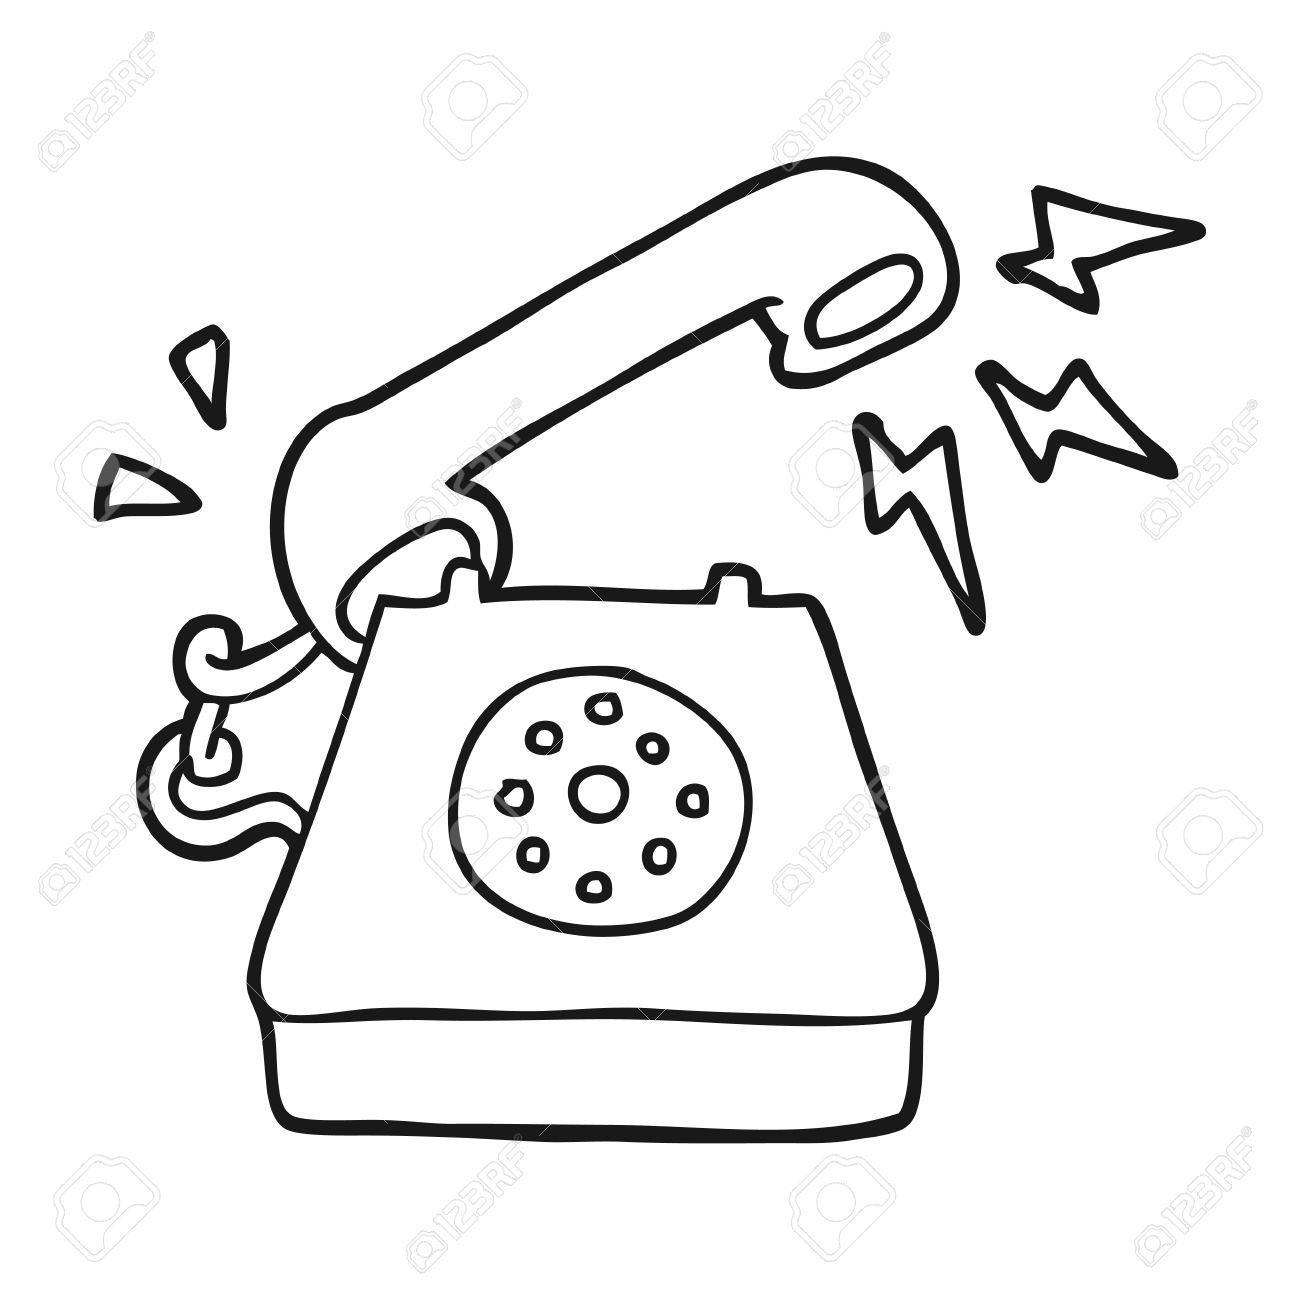 freehand drawn black and white cartoon ringing telephone.